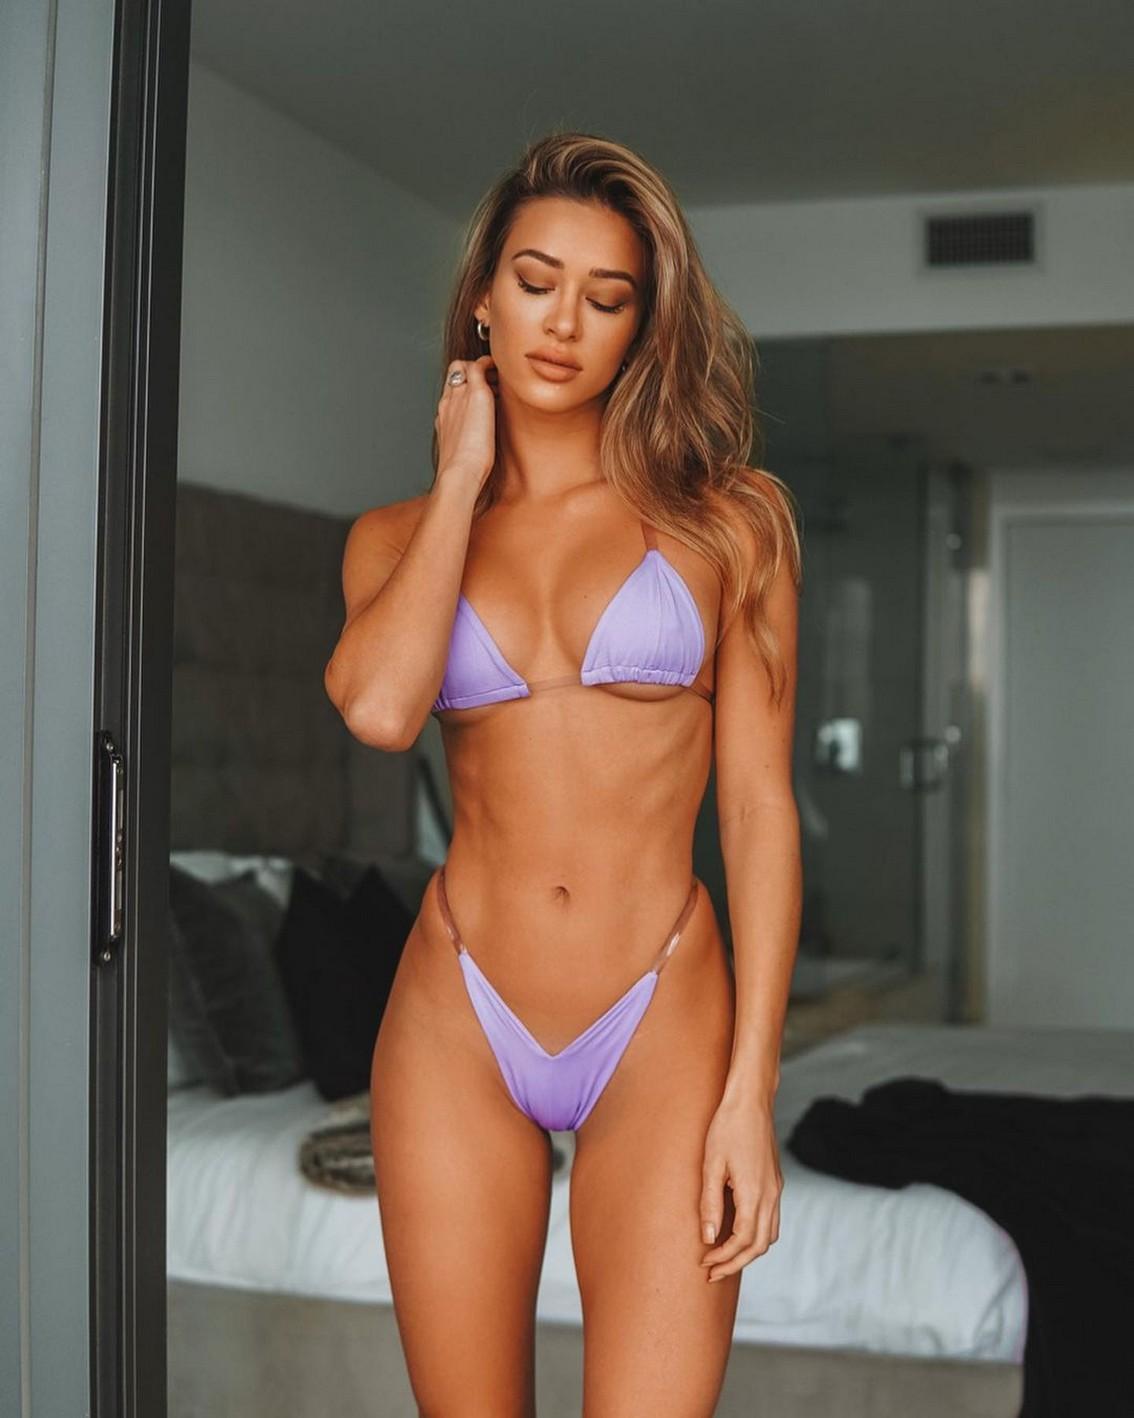 Cindy Prado Hottest Bikini Model In The World